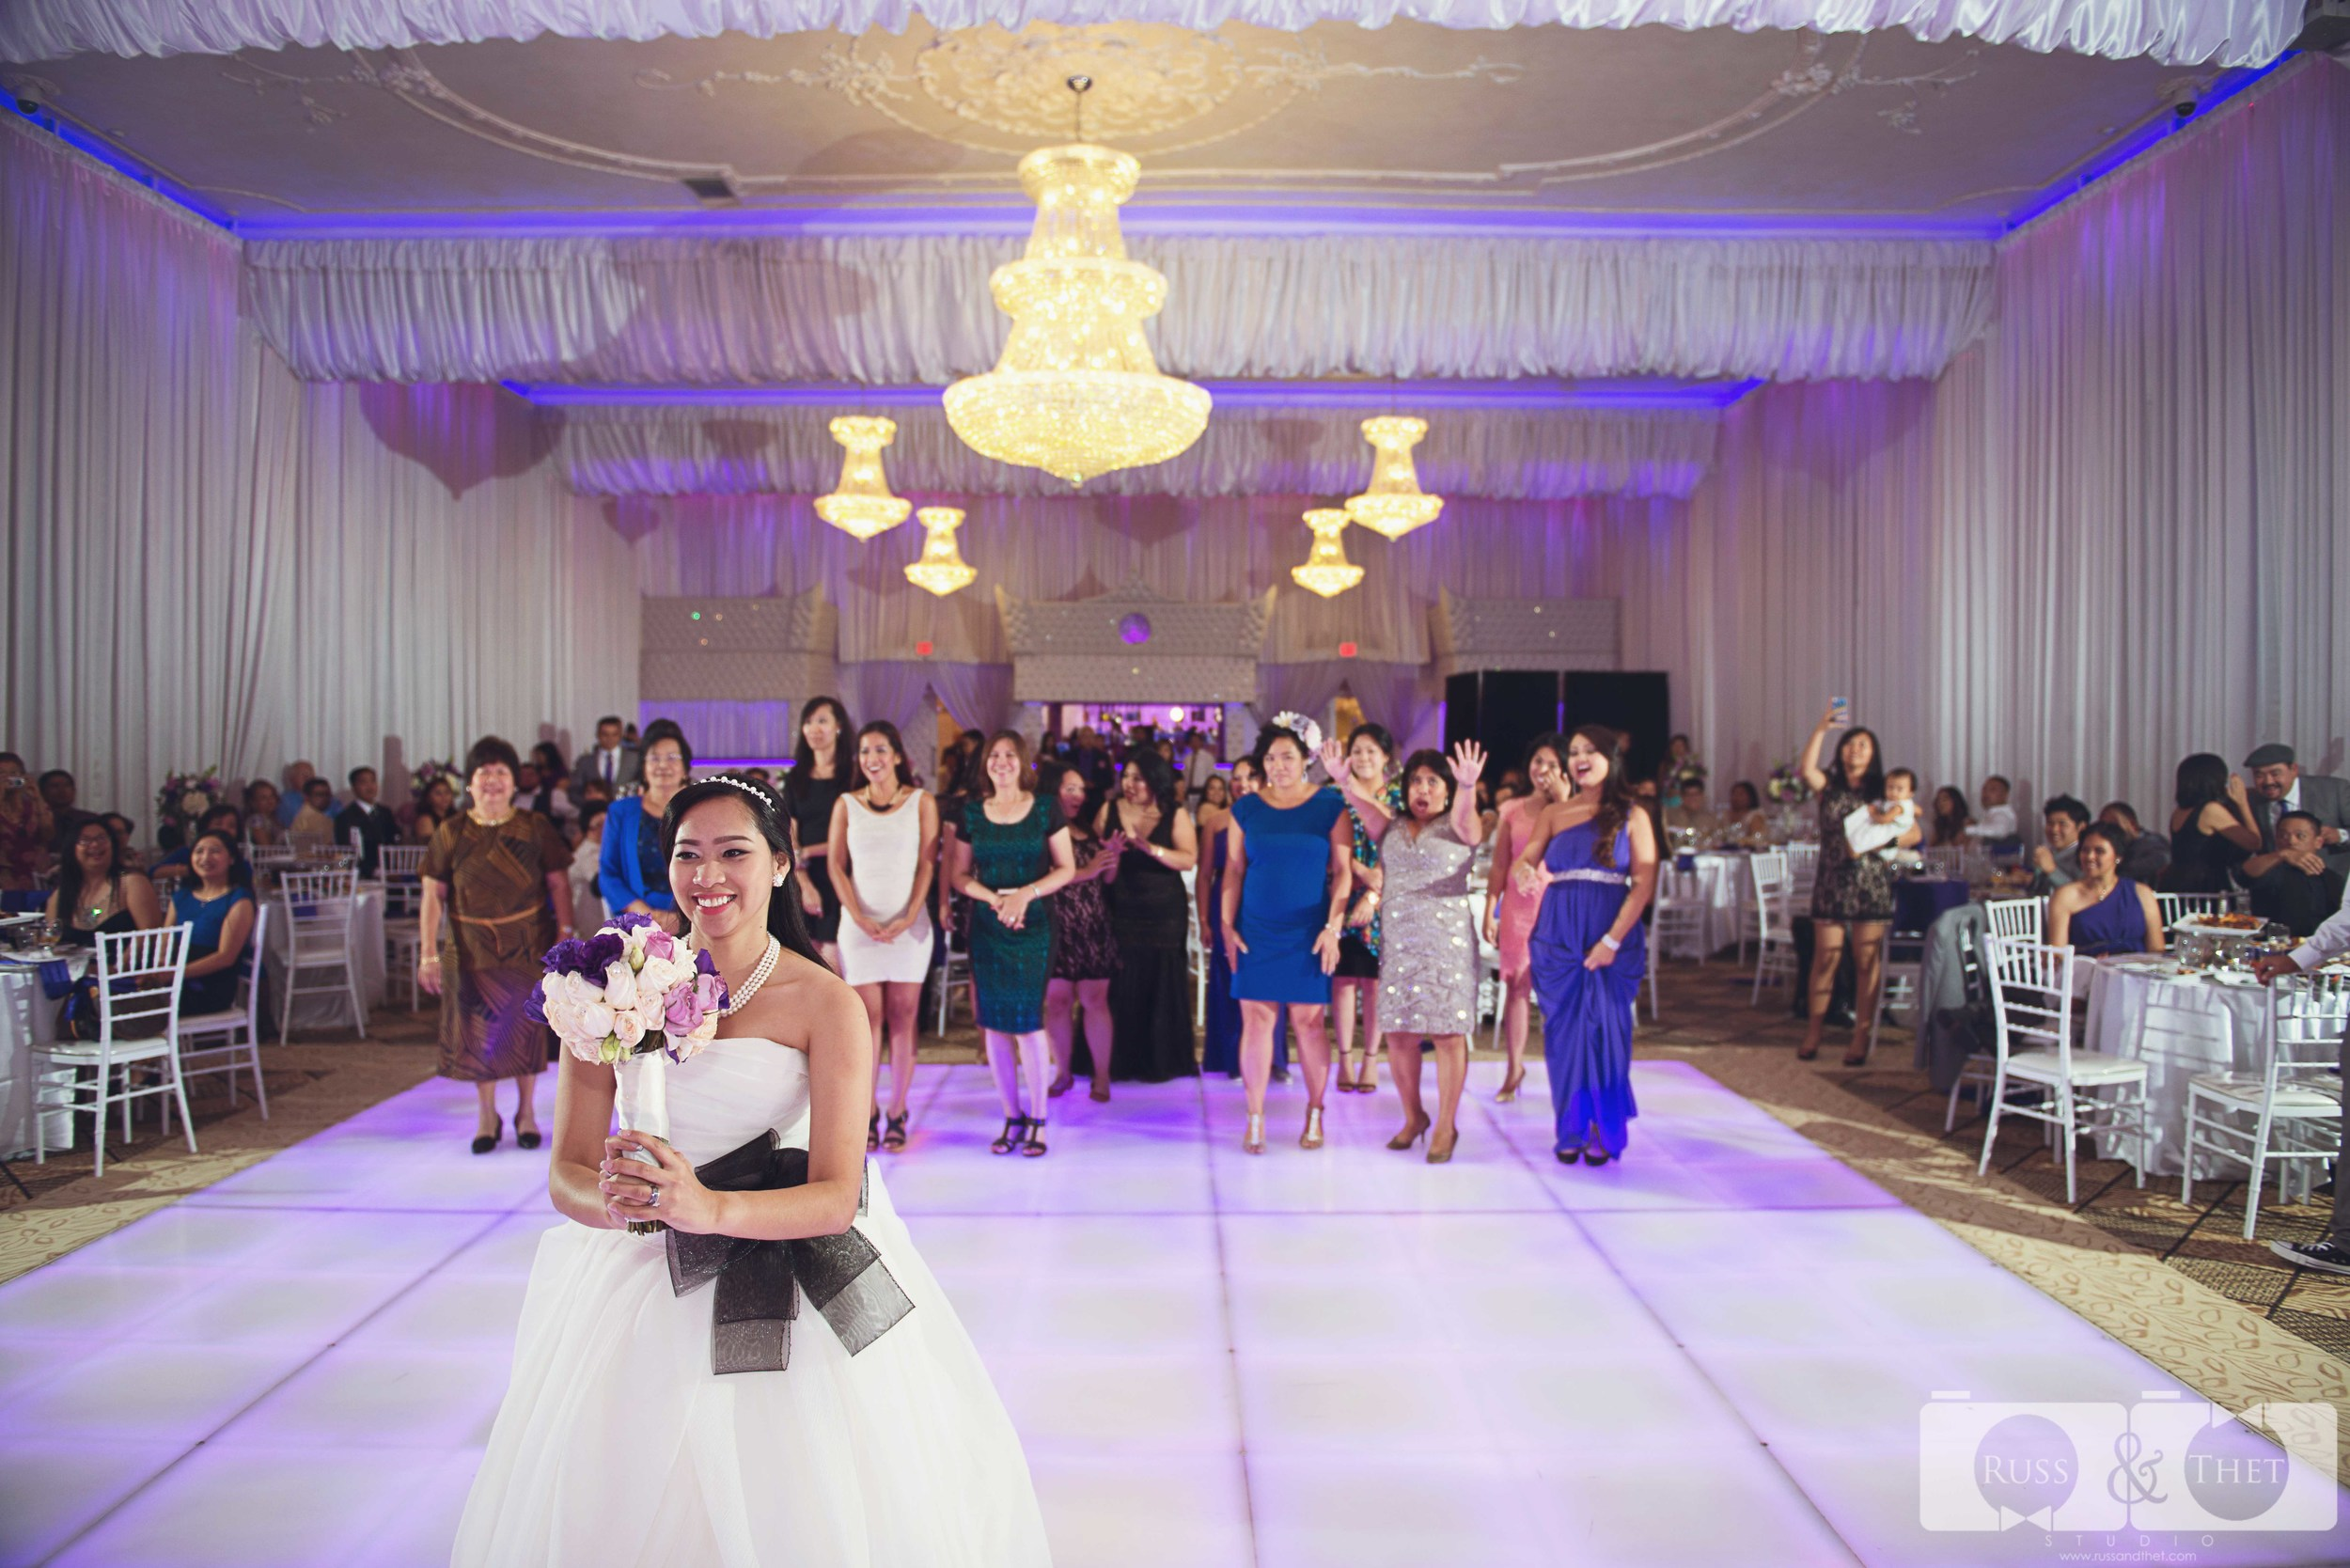 royal-palace-banquet-hall-glendale-wedding-67.JPG